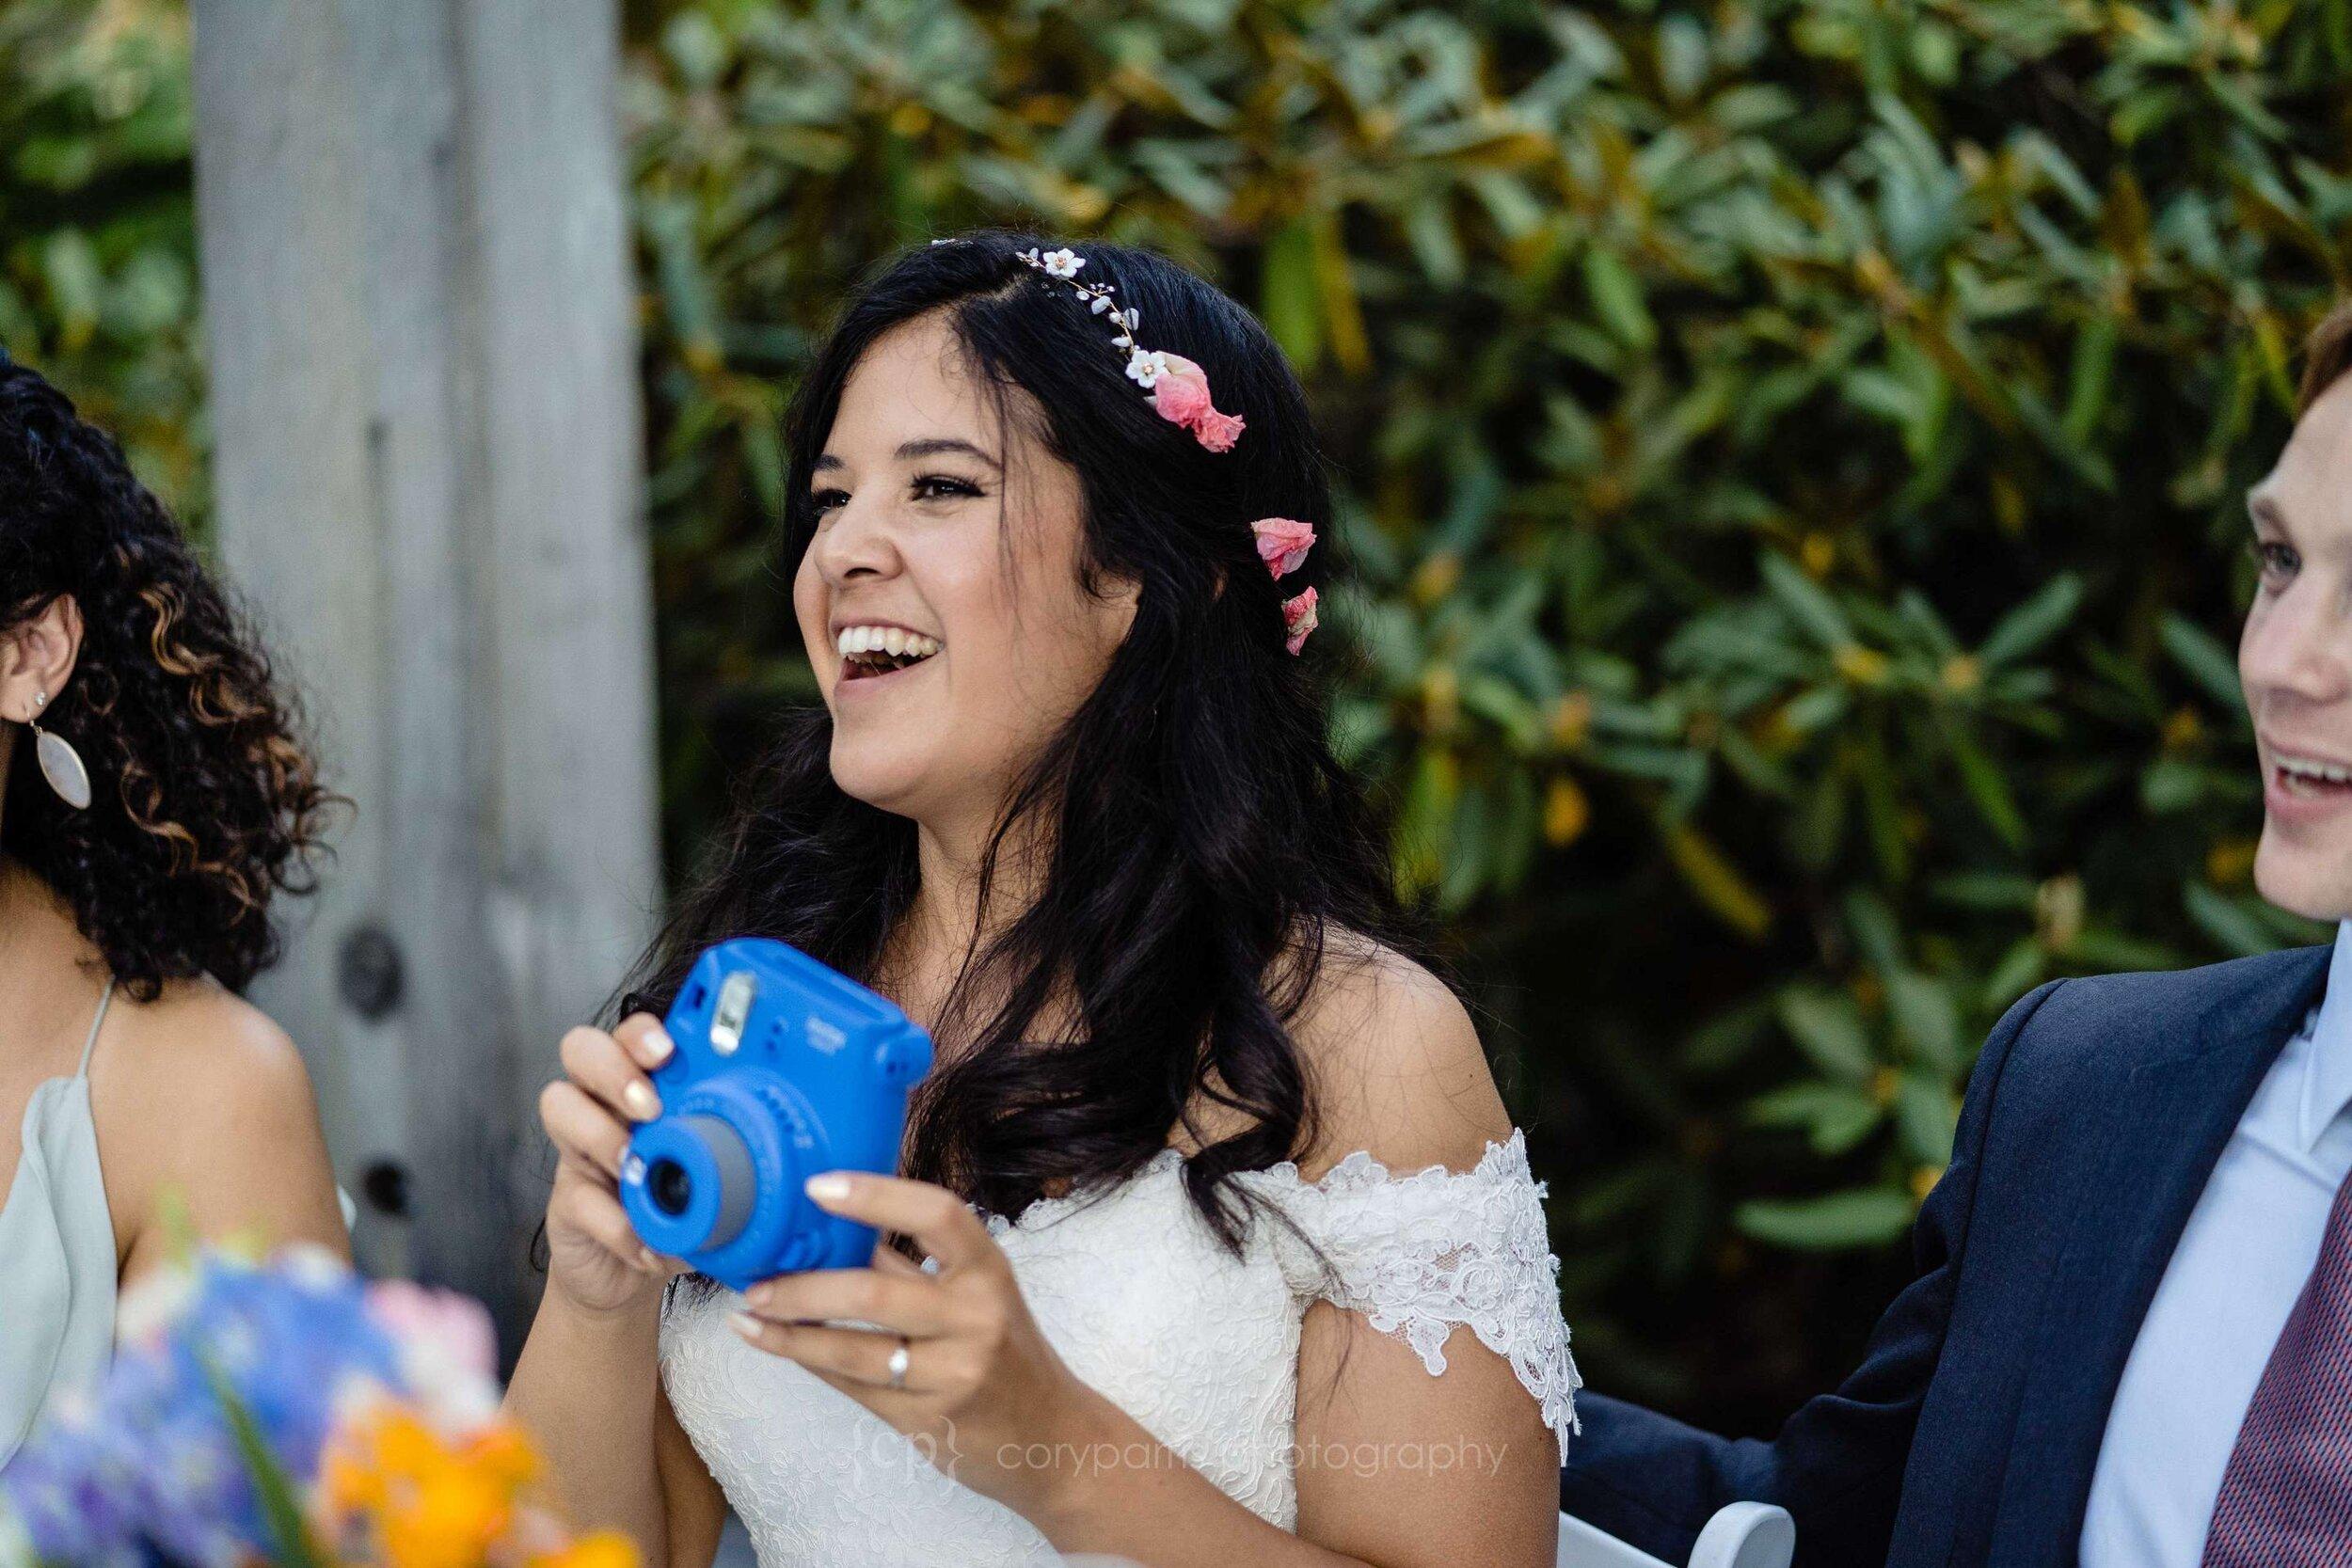 546-washington-park-arboretum-wedding.jpg